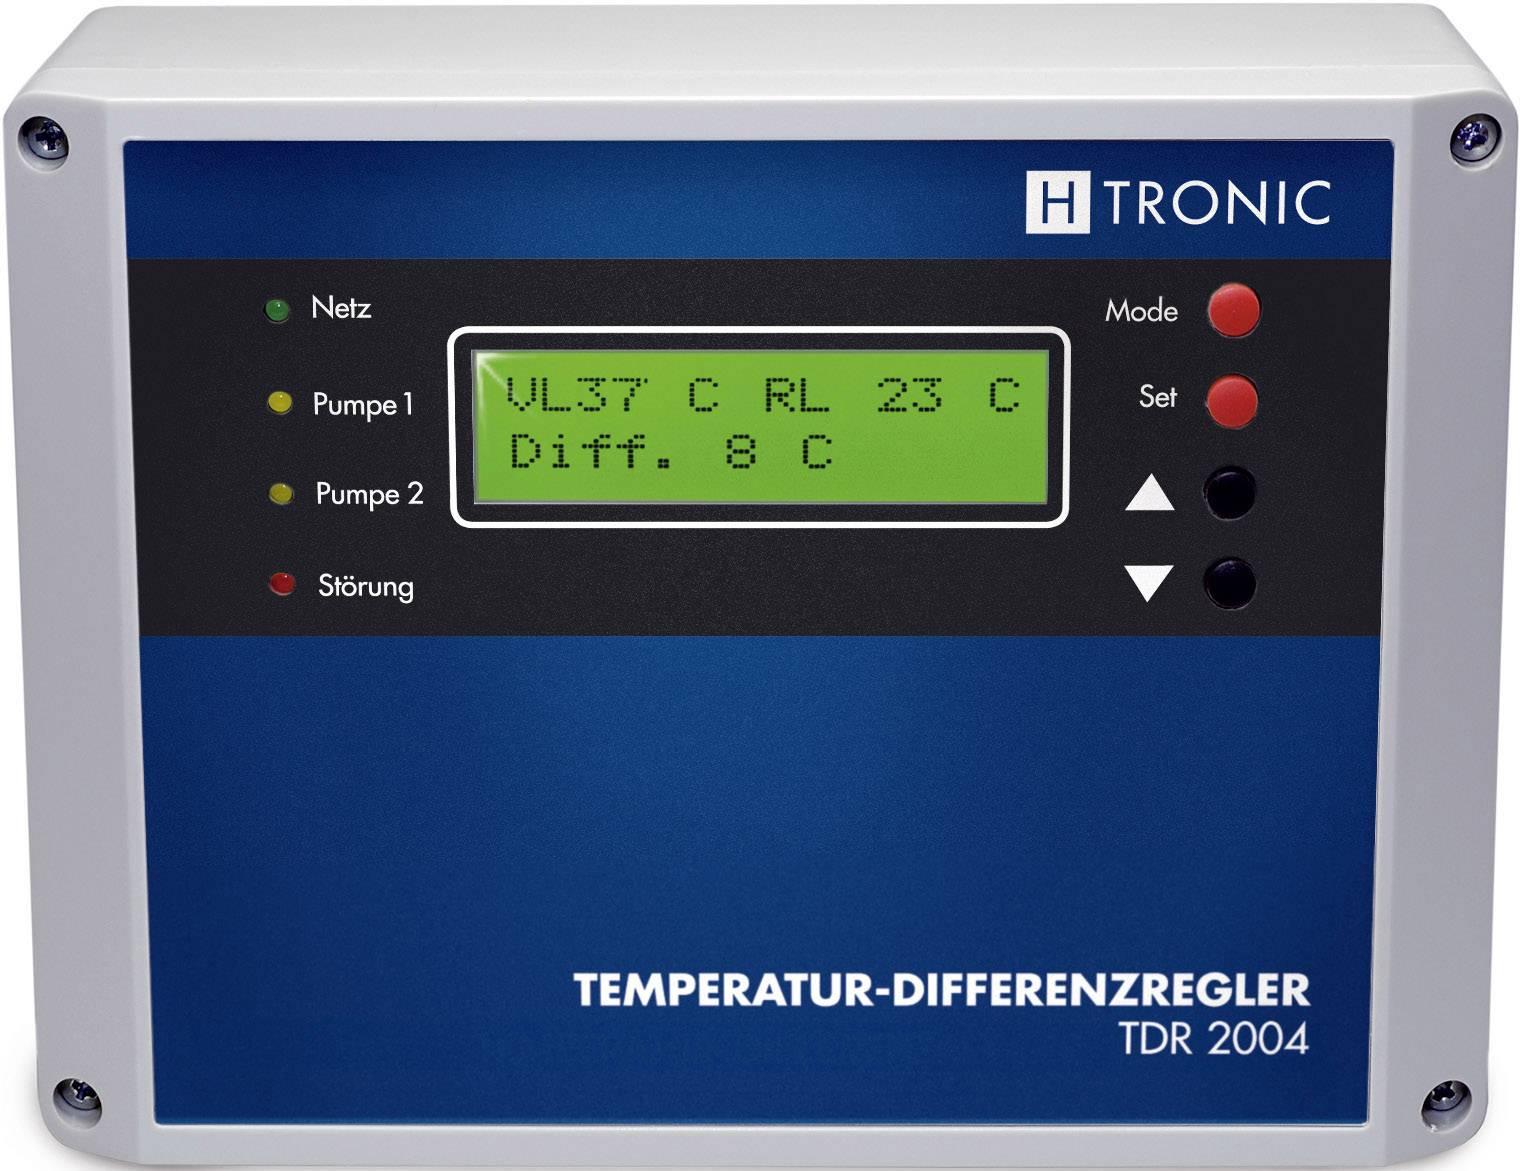 Rozdílový regulátor teploty H-Tronic 110990, s čítačem